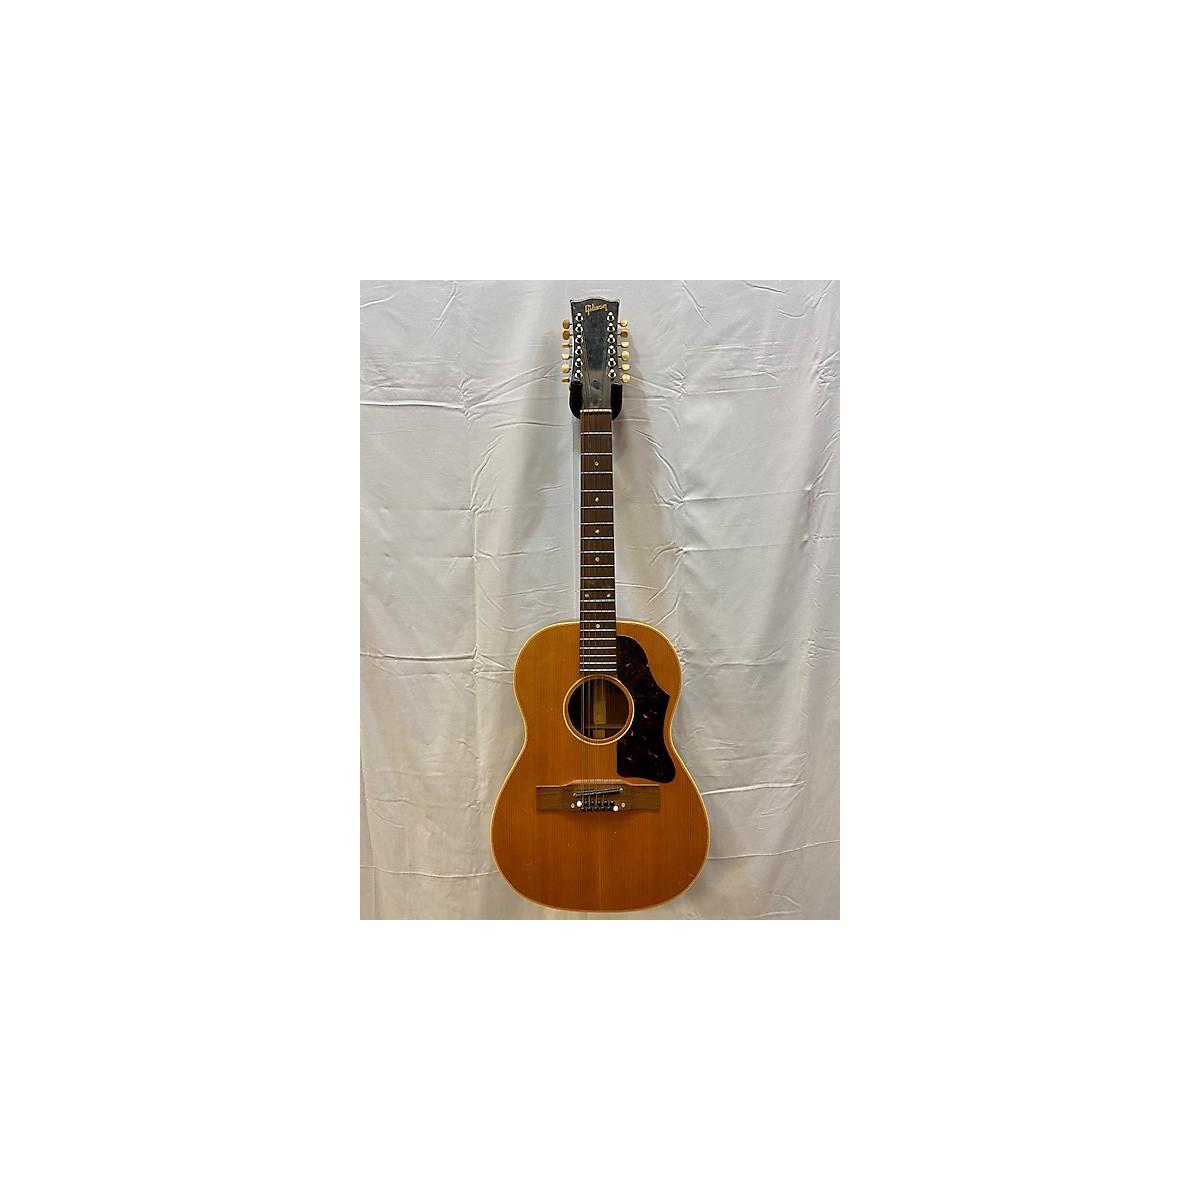 Gibson 1963 B-25-12-N 12 String Acoustic Guitar